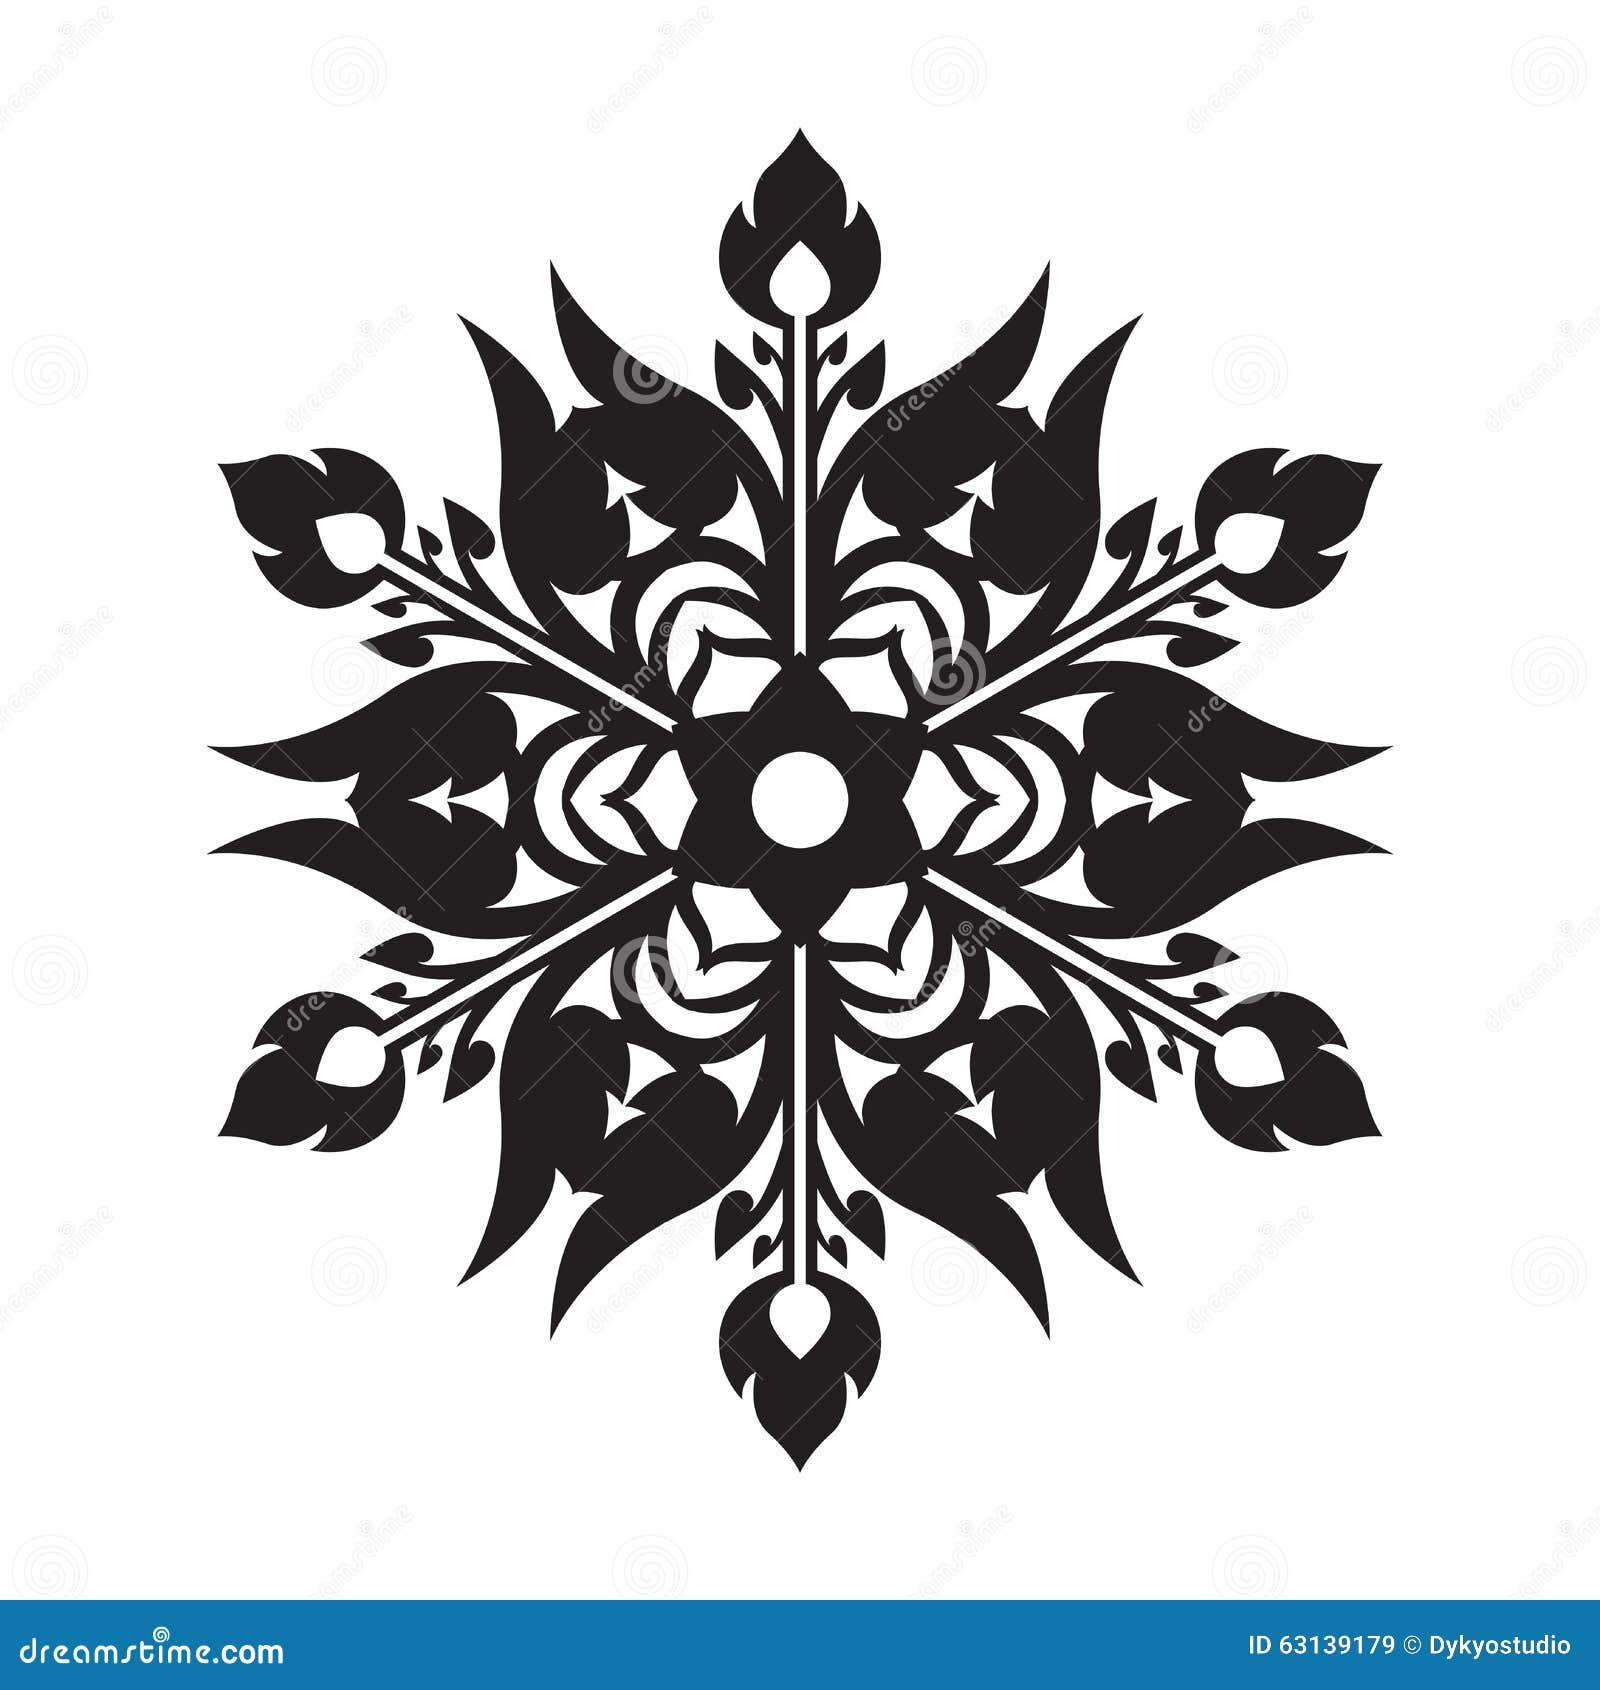 Art snowflake